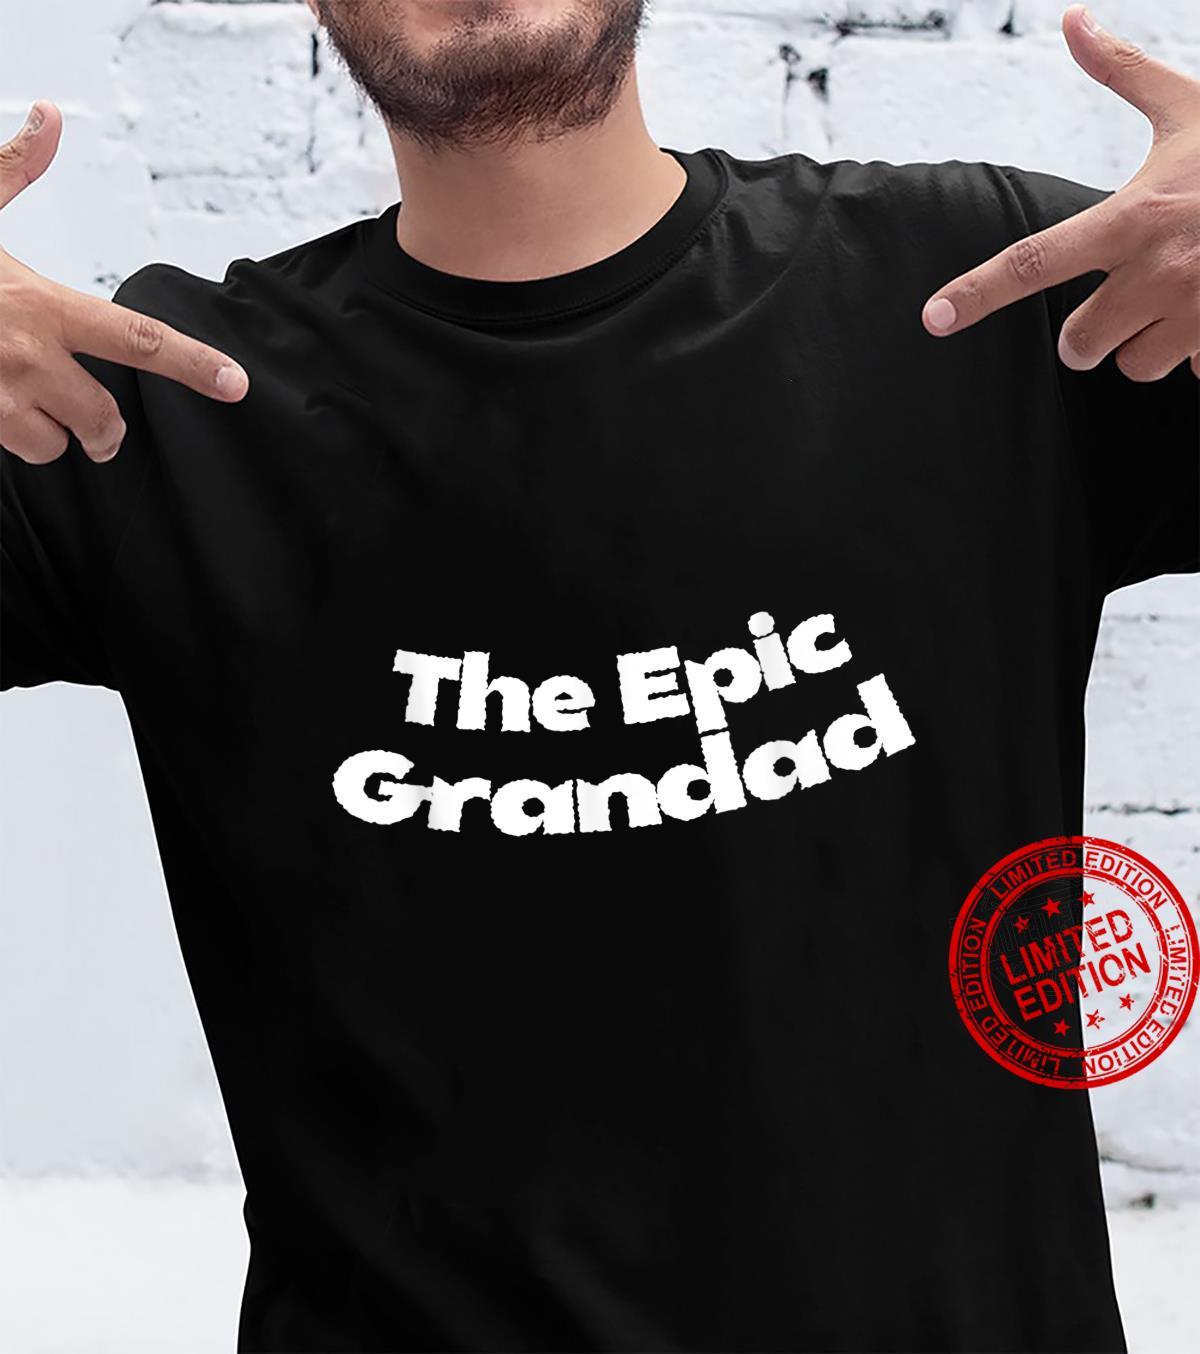 The Epic Grandad Father's Day Grandpa Love Granddad Shirt